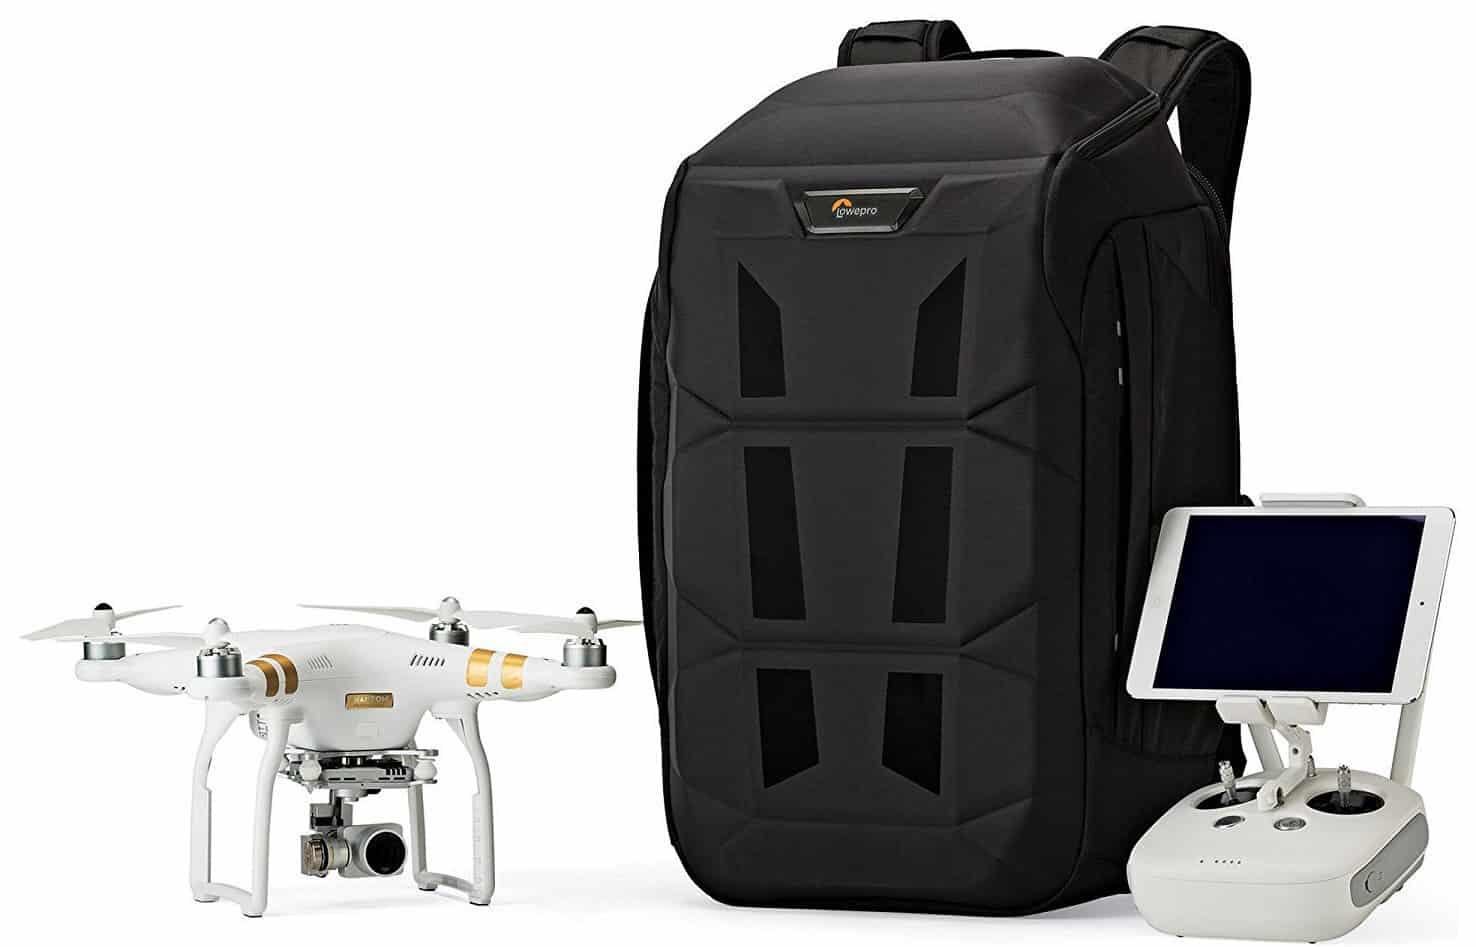 The Lowepro DroneGuard BP 450 Review